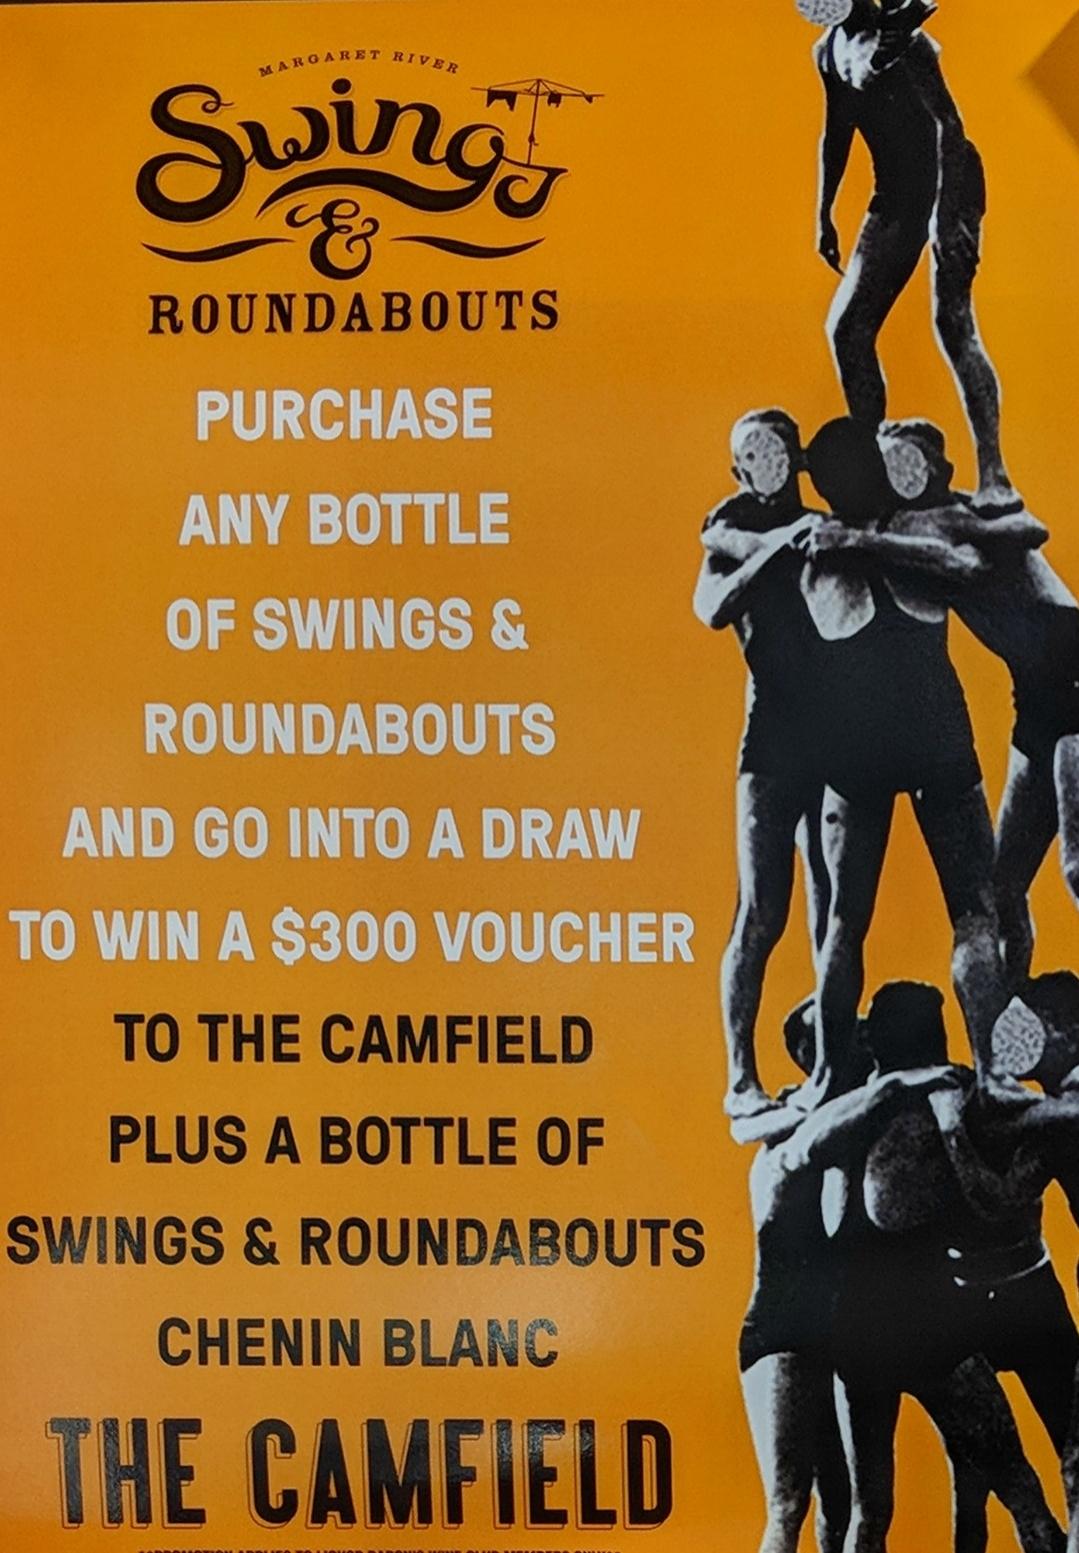 swings and roundabouts camfield comp.jpg